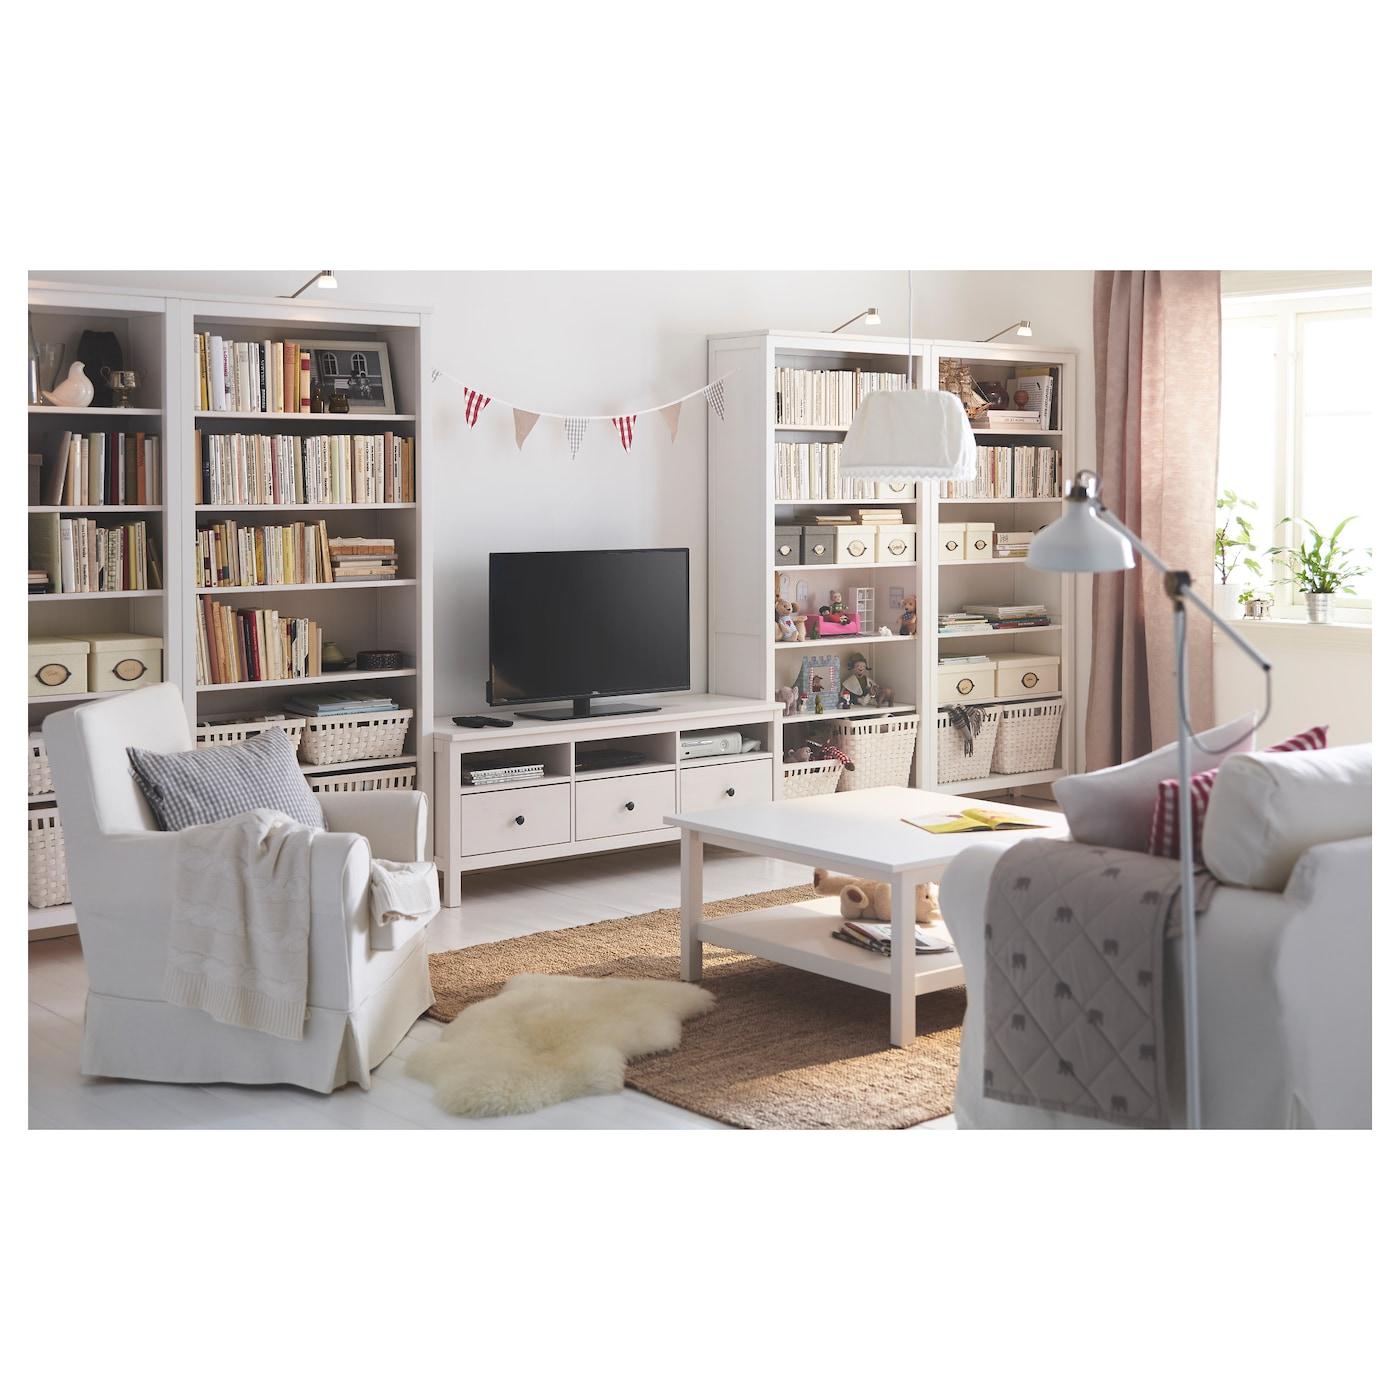 Hemnes Banc Tv Teinté Blanc 148 X 47 X 57 Cm Ikea